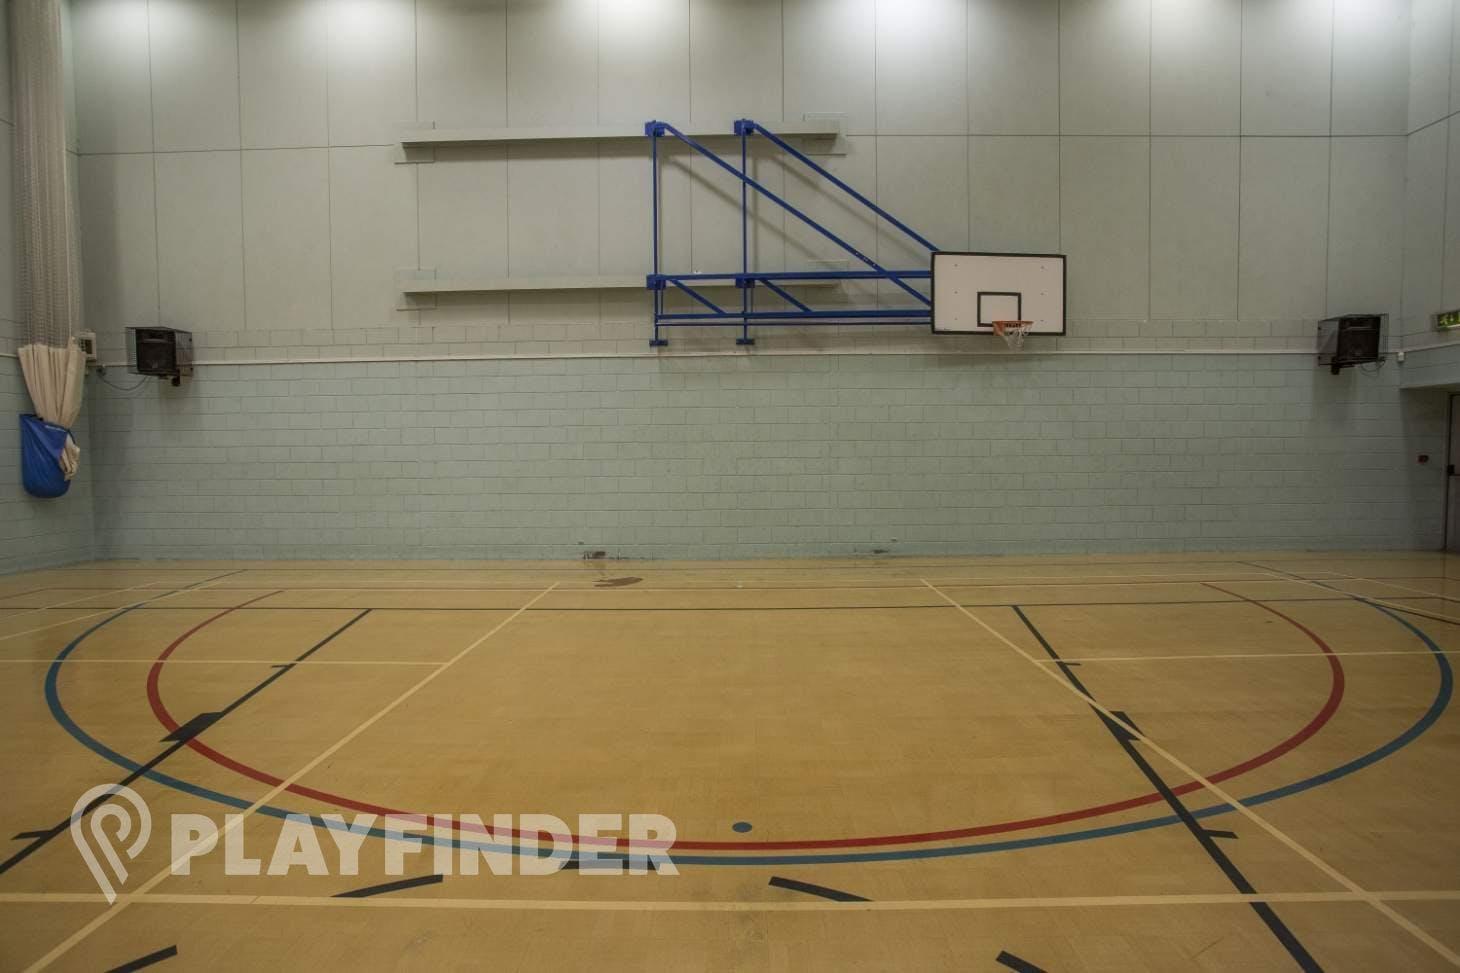 Erith Leisure Centre Indoor basketball court